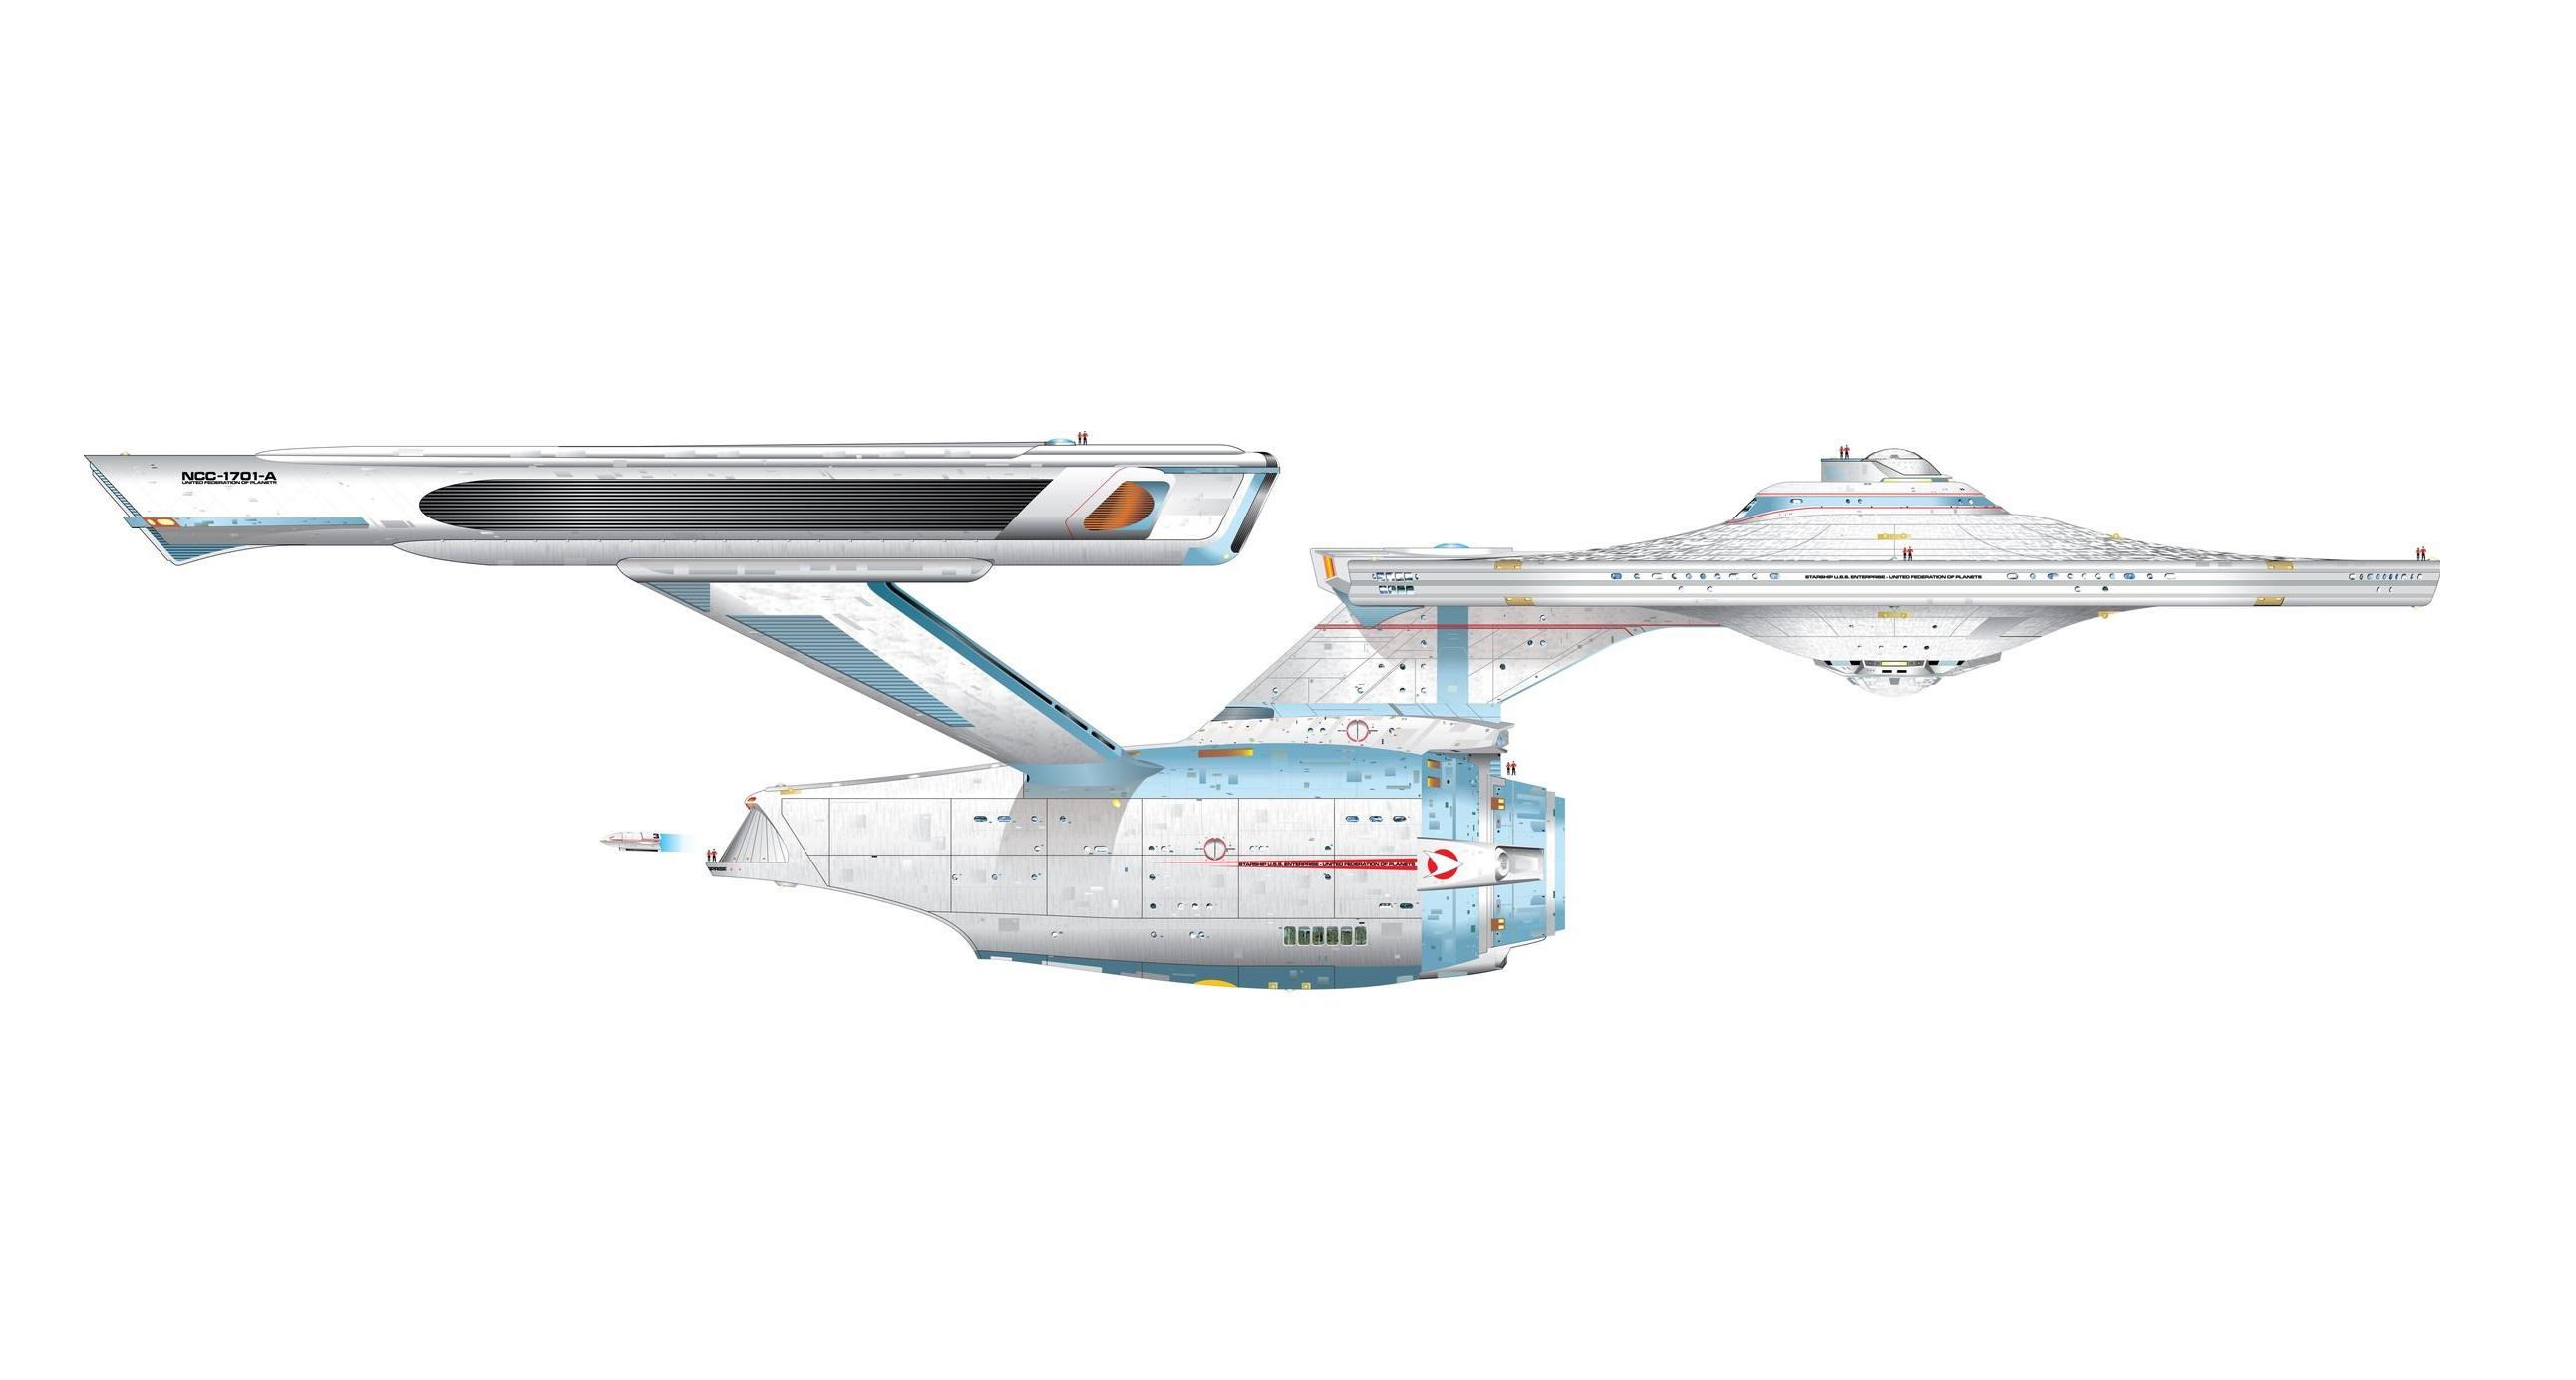 Enterprise-NCC-1701-A